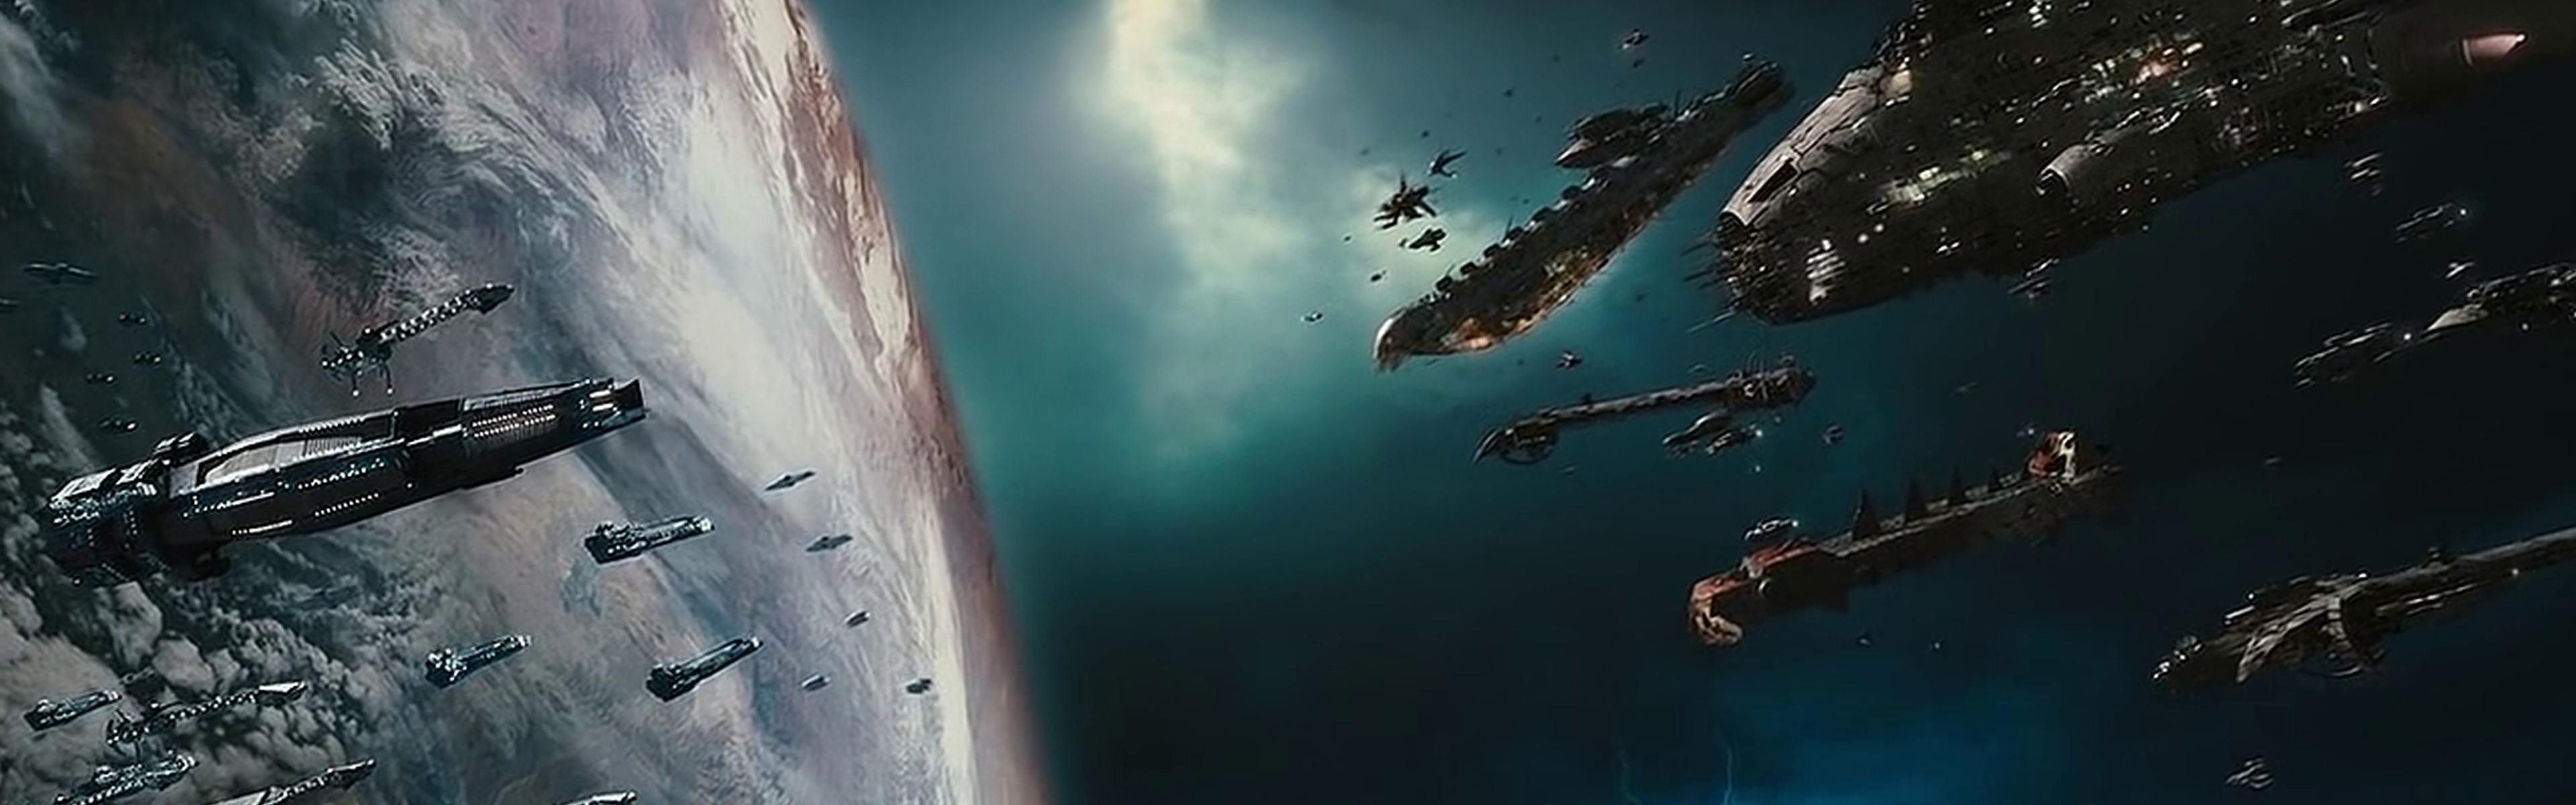 Screen wallpaper · Firefly